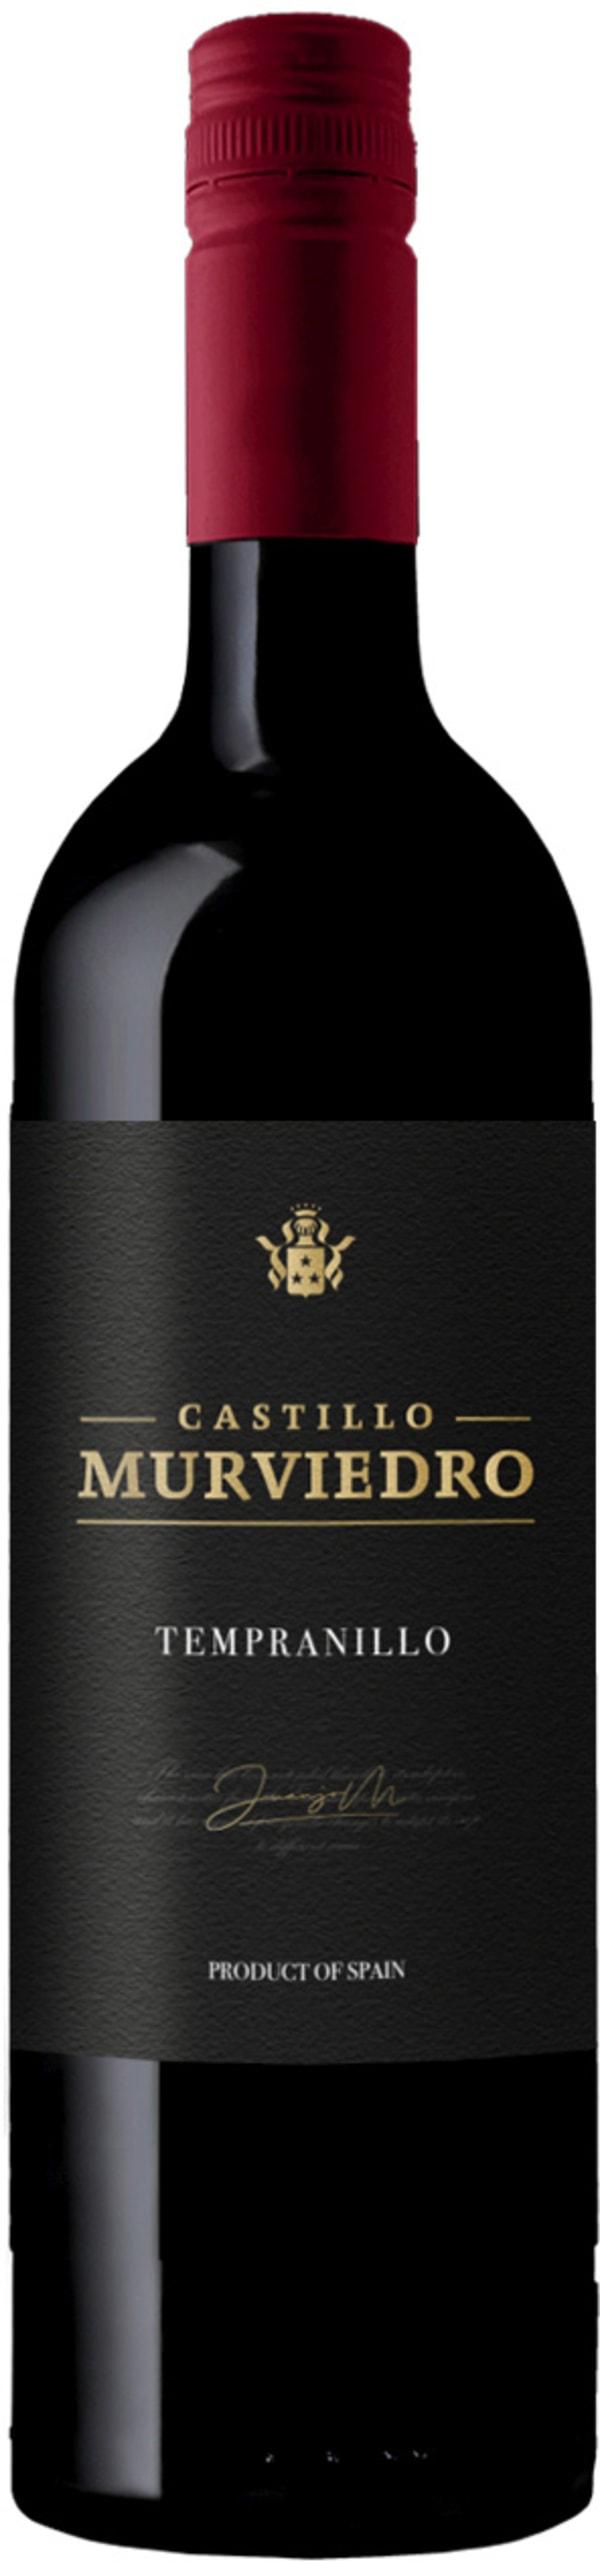 Castillo Murviedro Tempranillo 2019